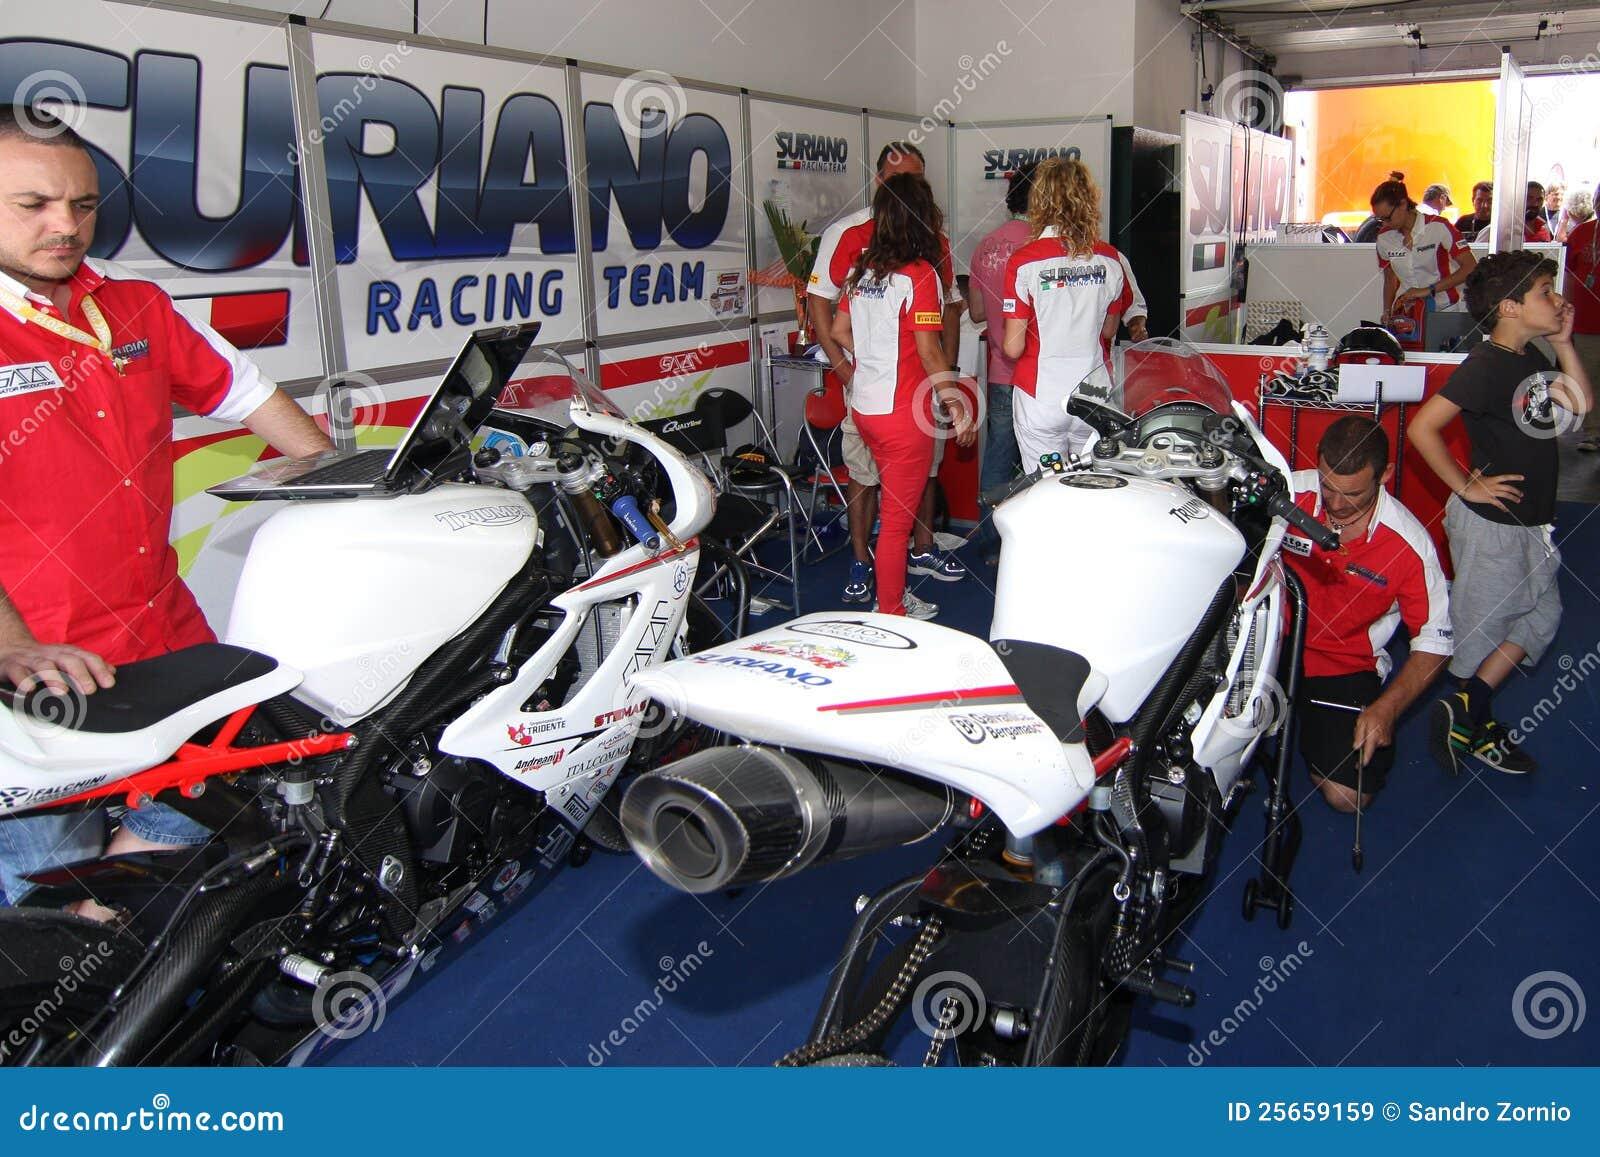 Power team by Suriano Triumph Daytona